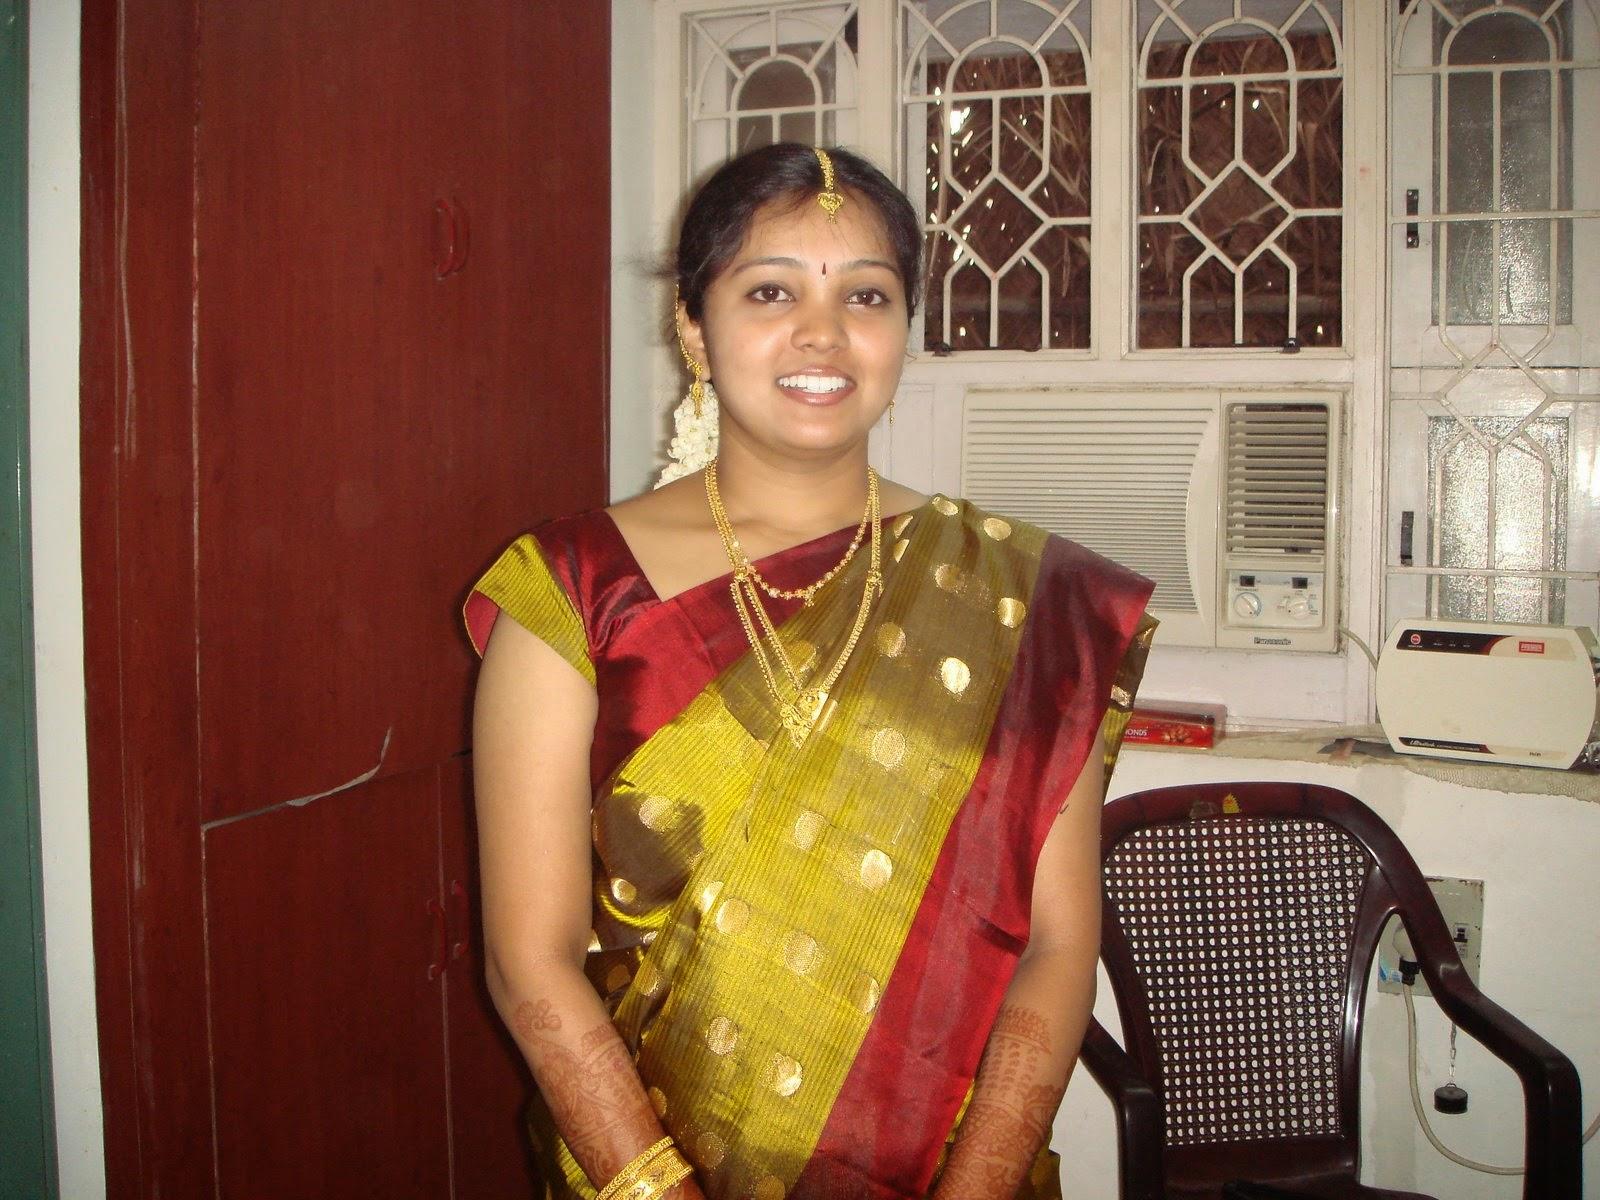 Desi Beautiful Girls In Saree Bold Pictures - Beautiful -4700